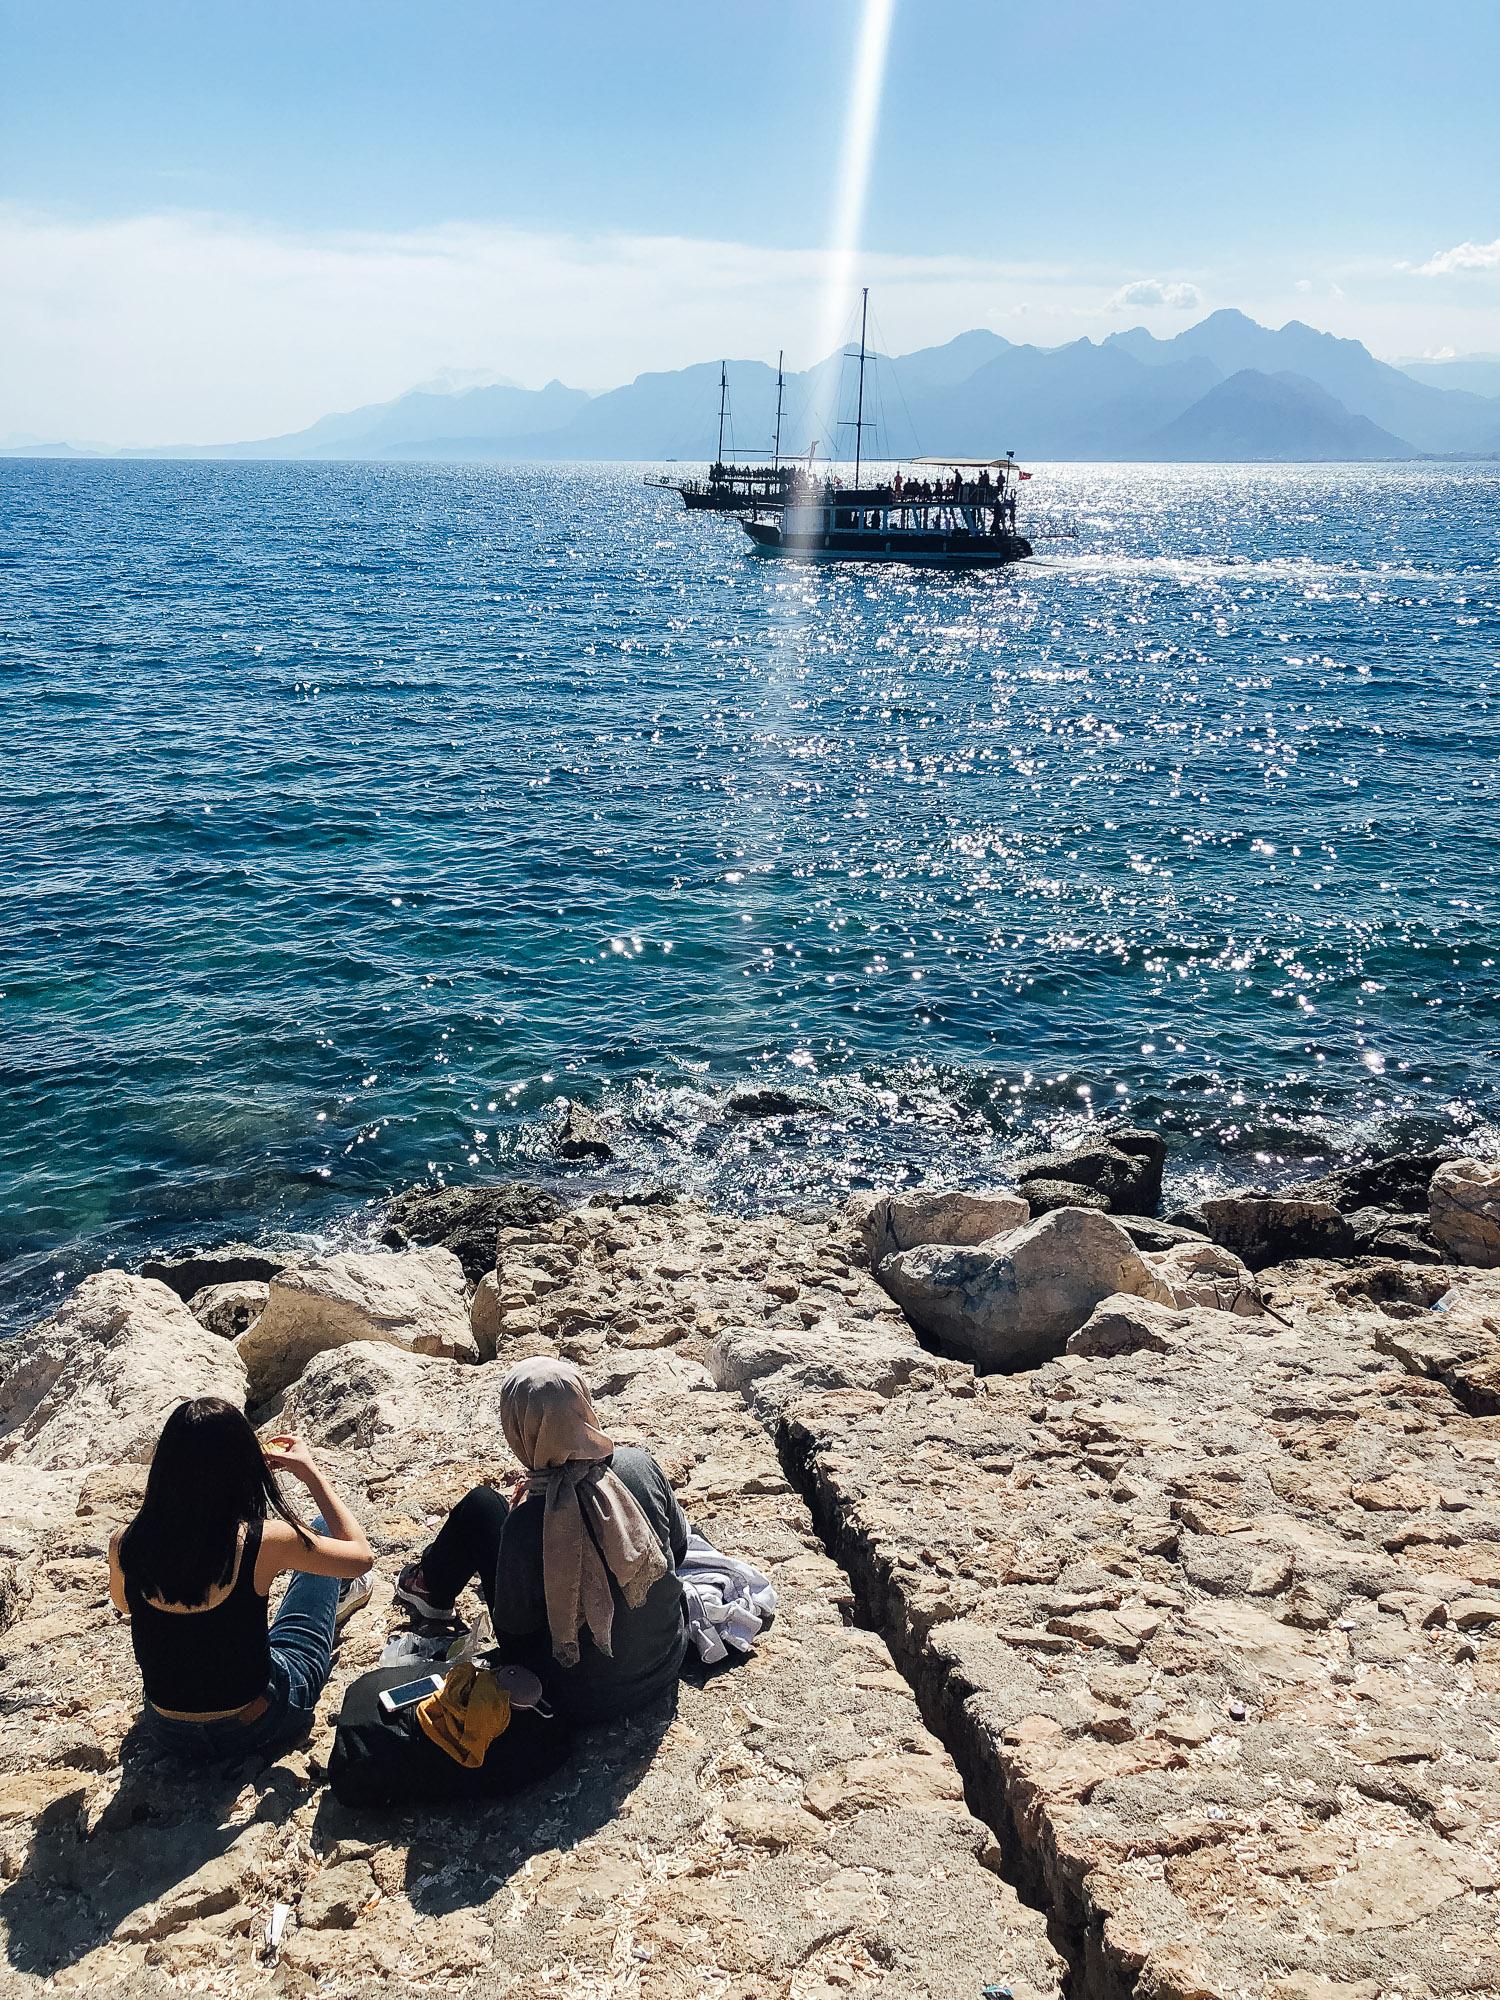 Teenage girls sharing stuffed mussels in Antalya.